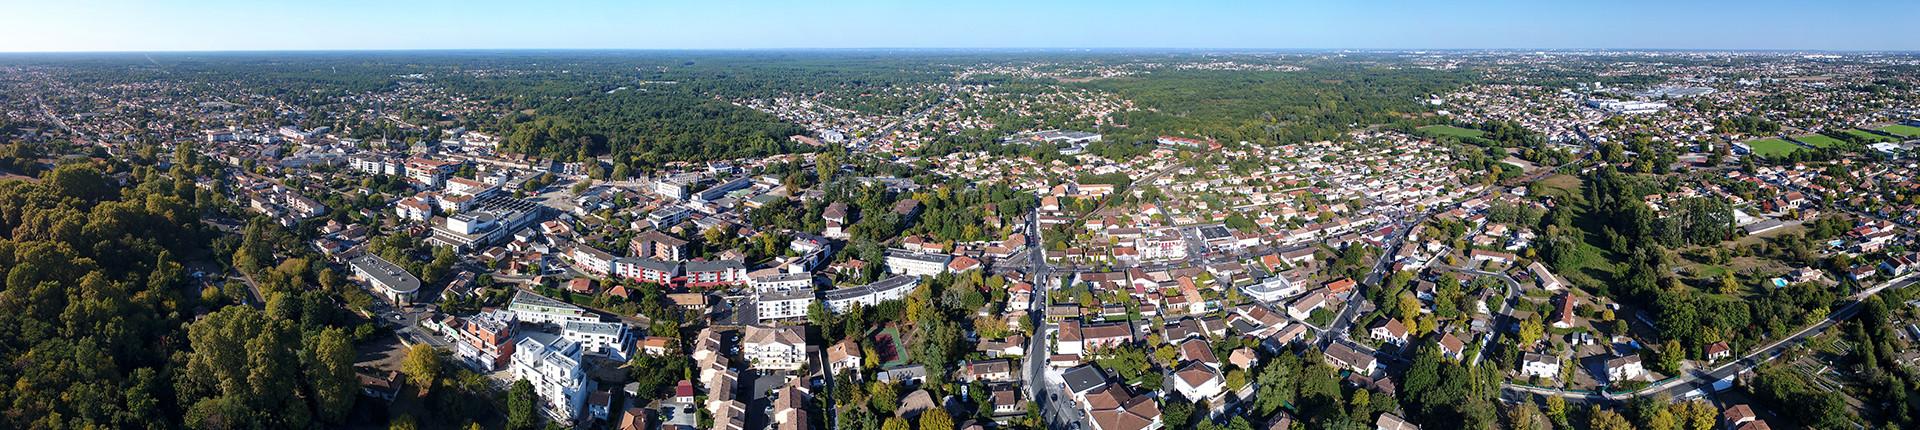 Tissus St Medard En Jalles saint-médard en bref - saint-médard-en-jalles